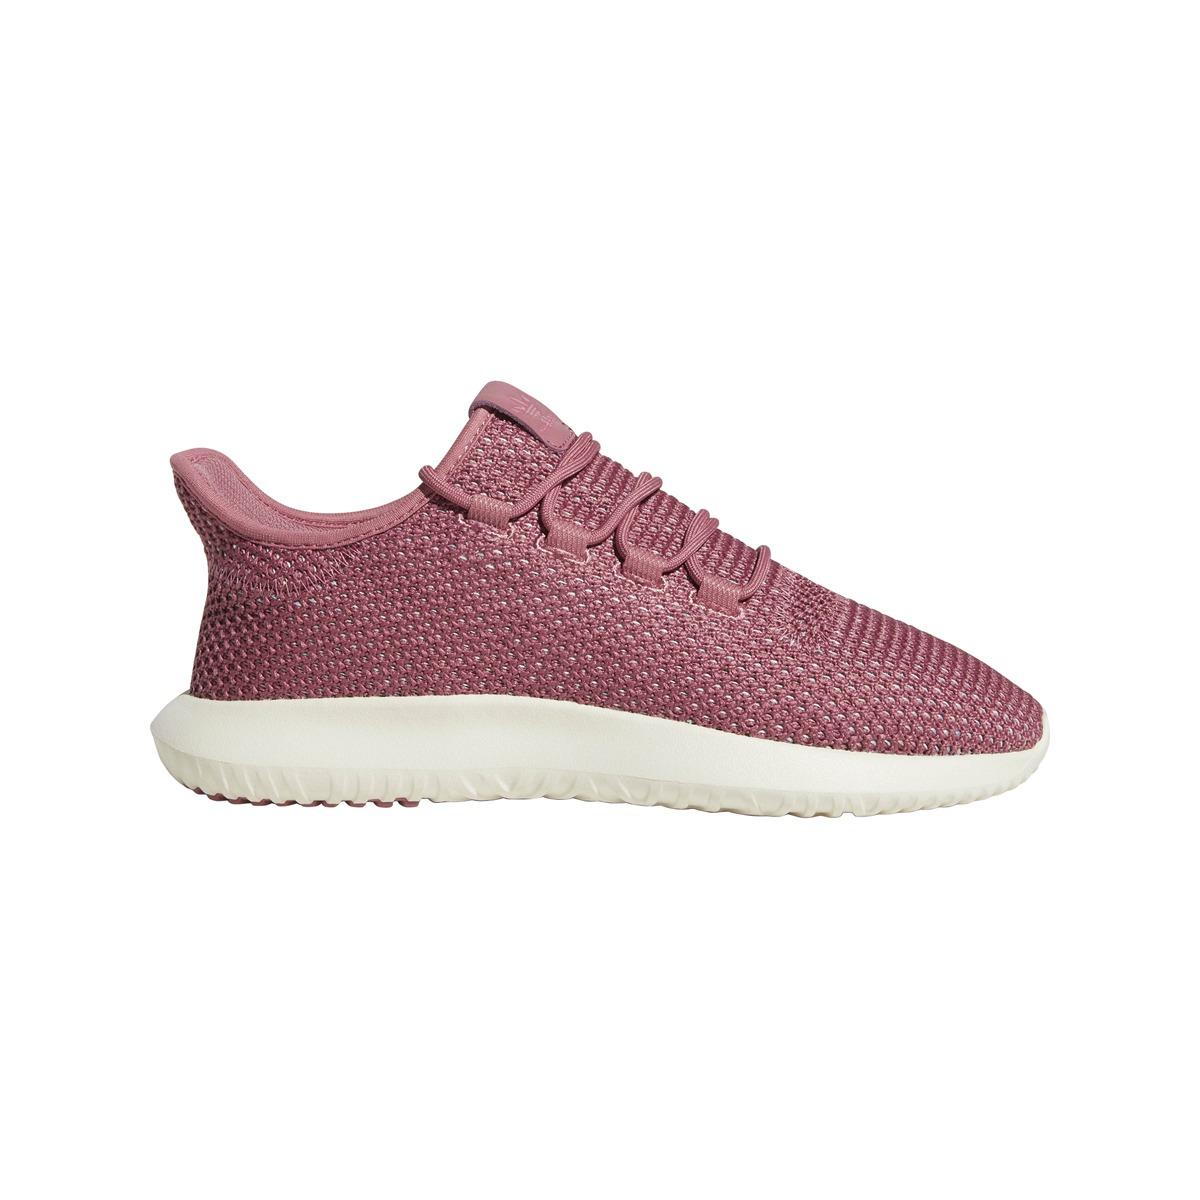 exclusivo Zapatos Adidas Mujer Adidas Originals TUBULAR